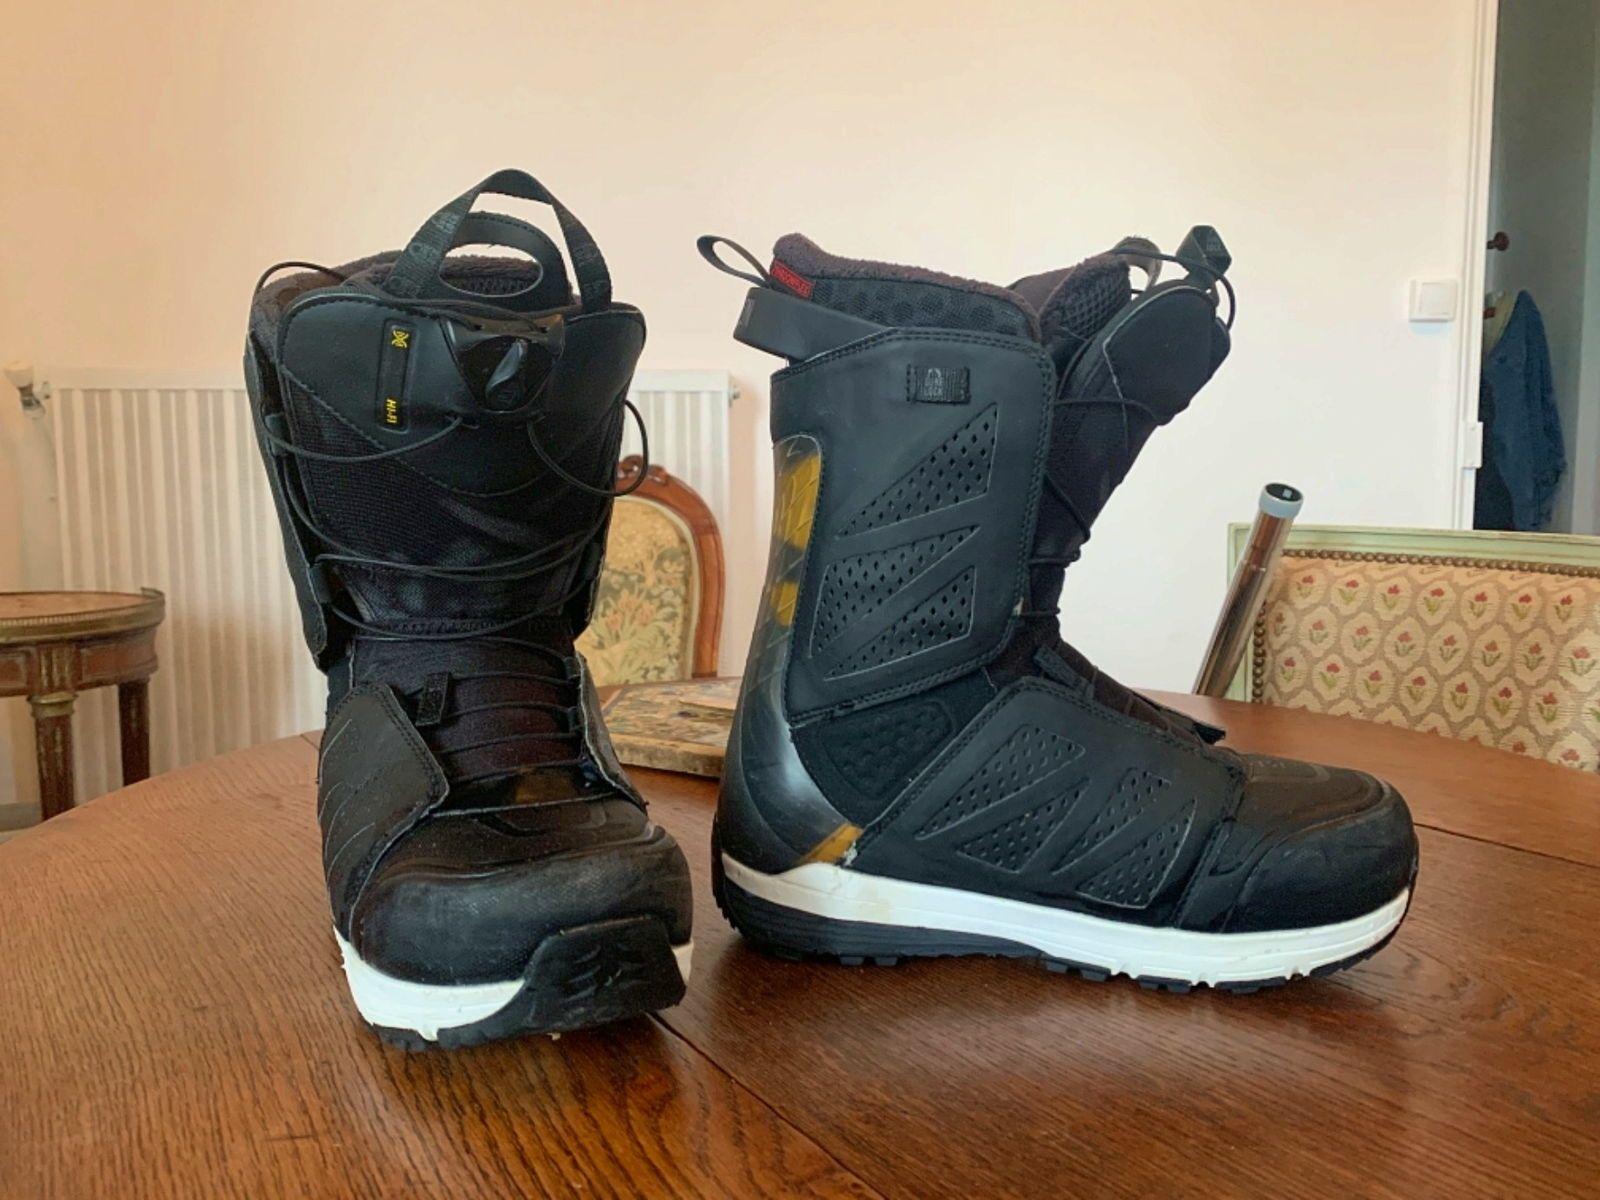 Bôtes de Snowboard - Salomon HI-FI (42cm)